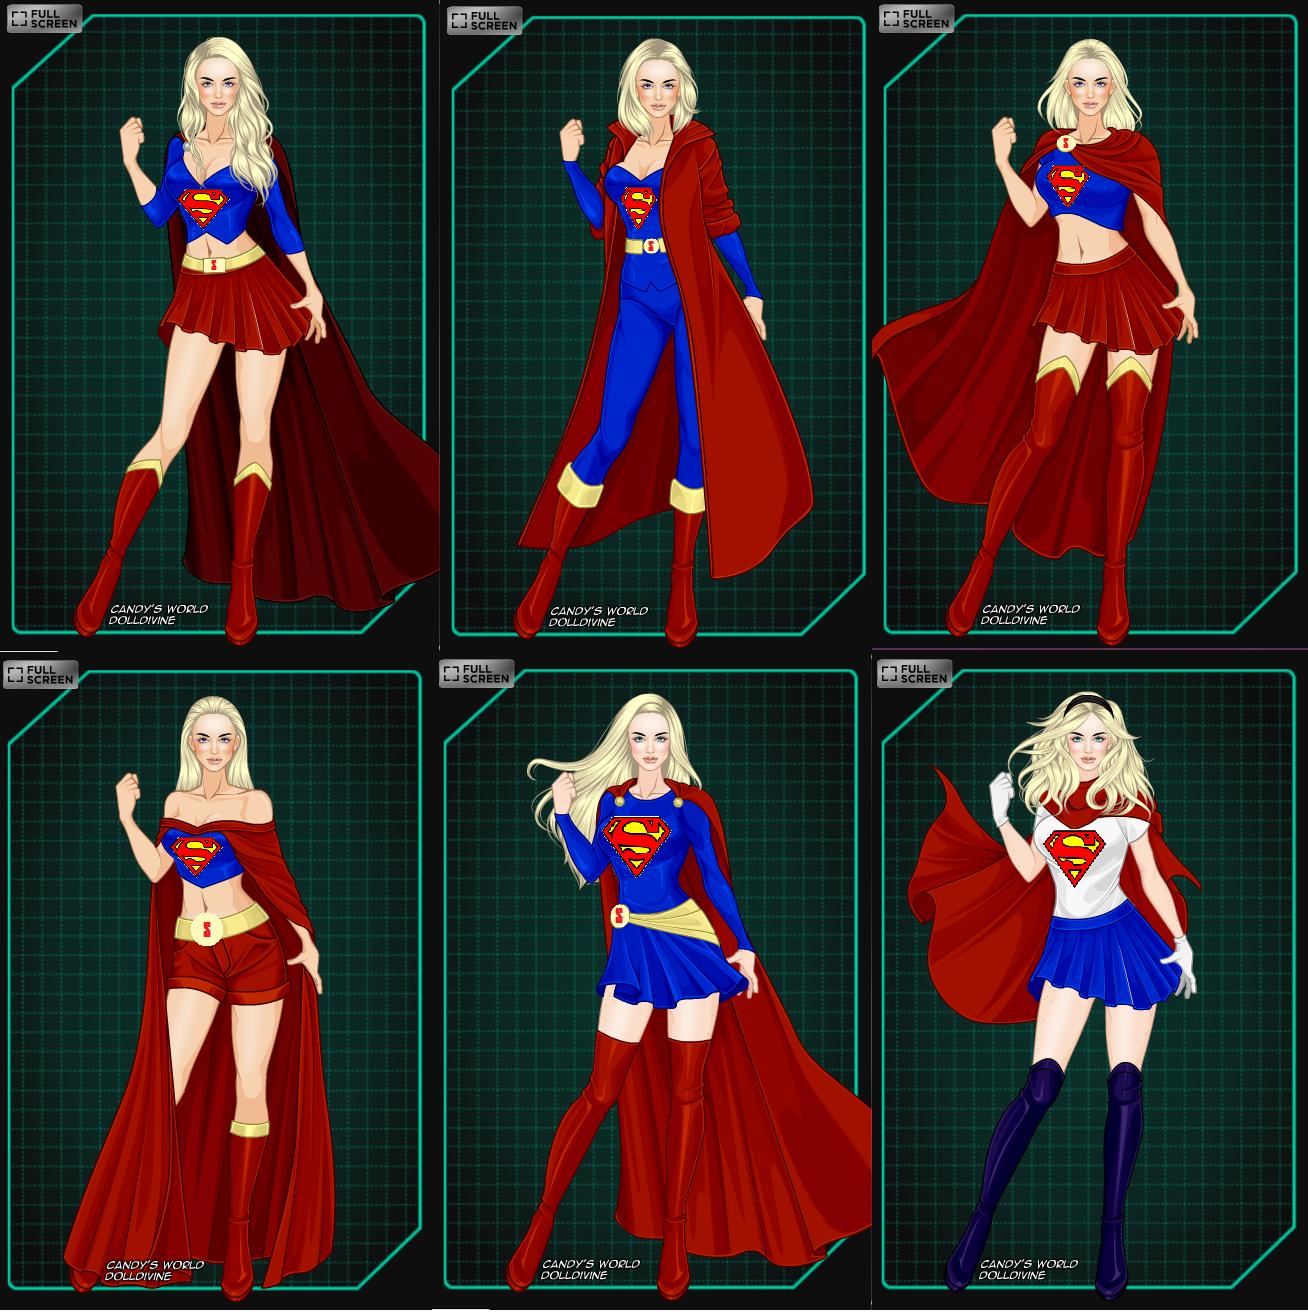 Supergirl Outfits By Misstudorwoman On Deviantart